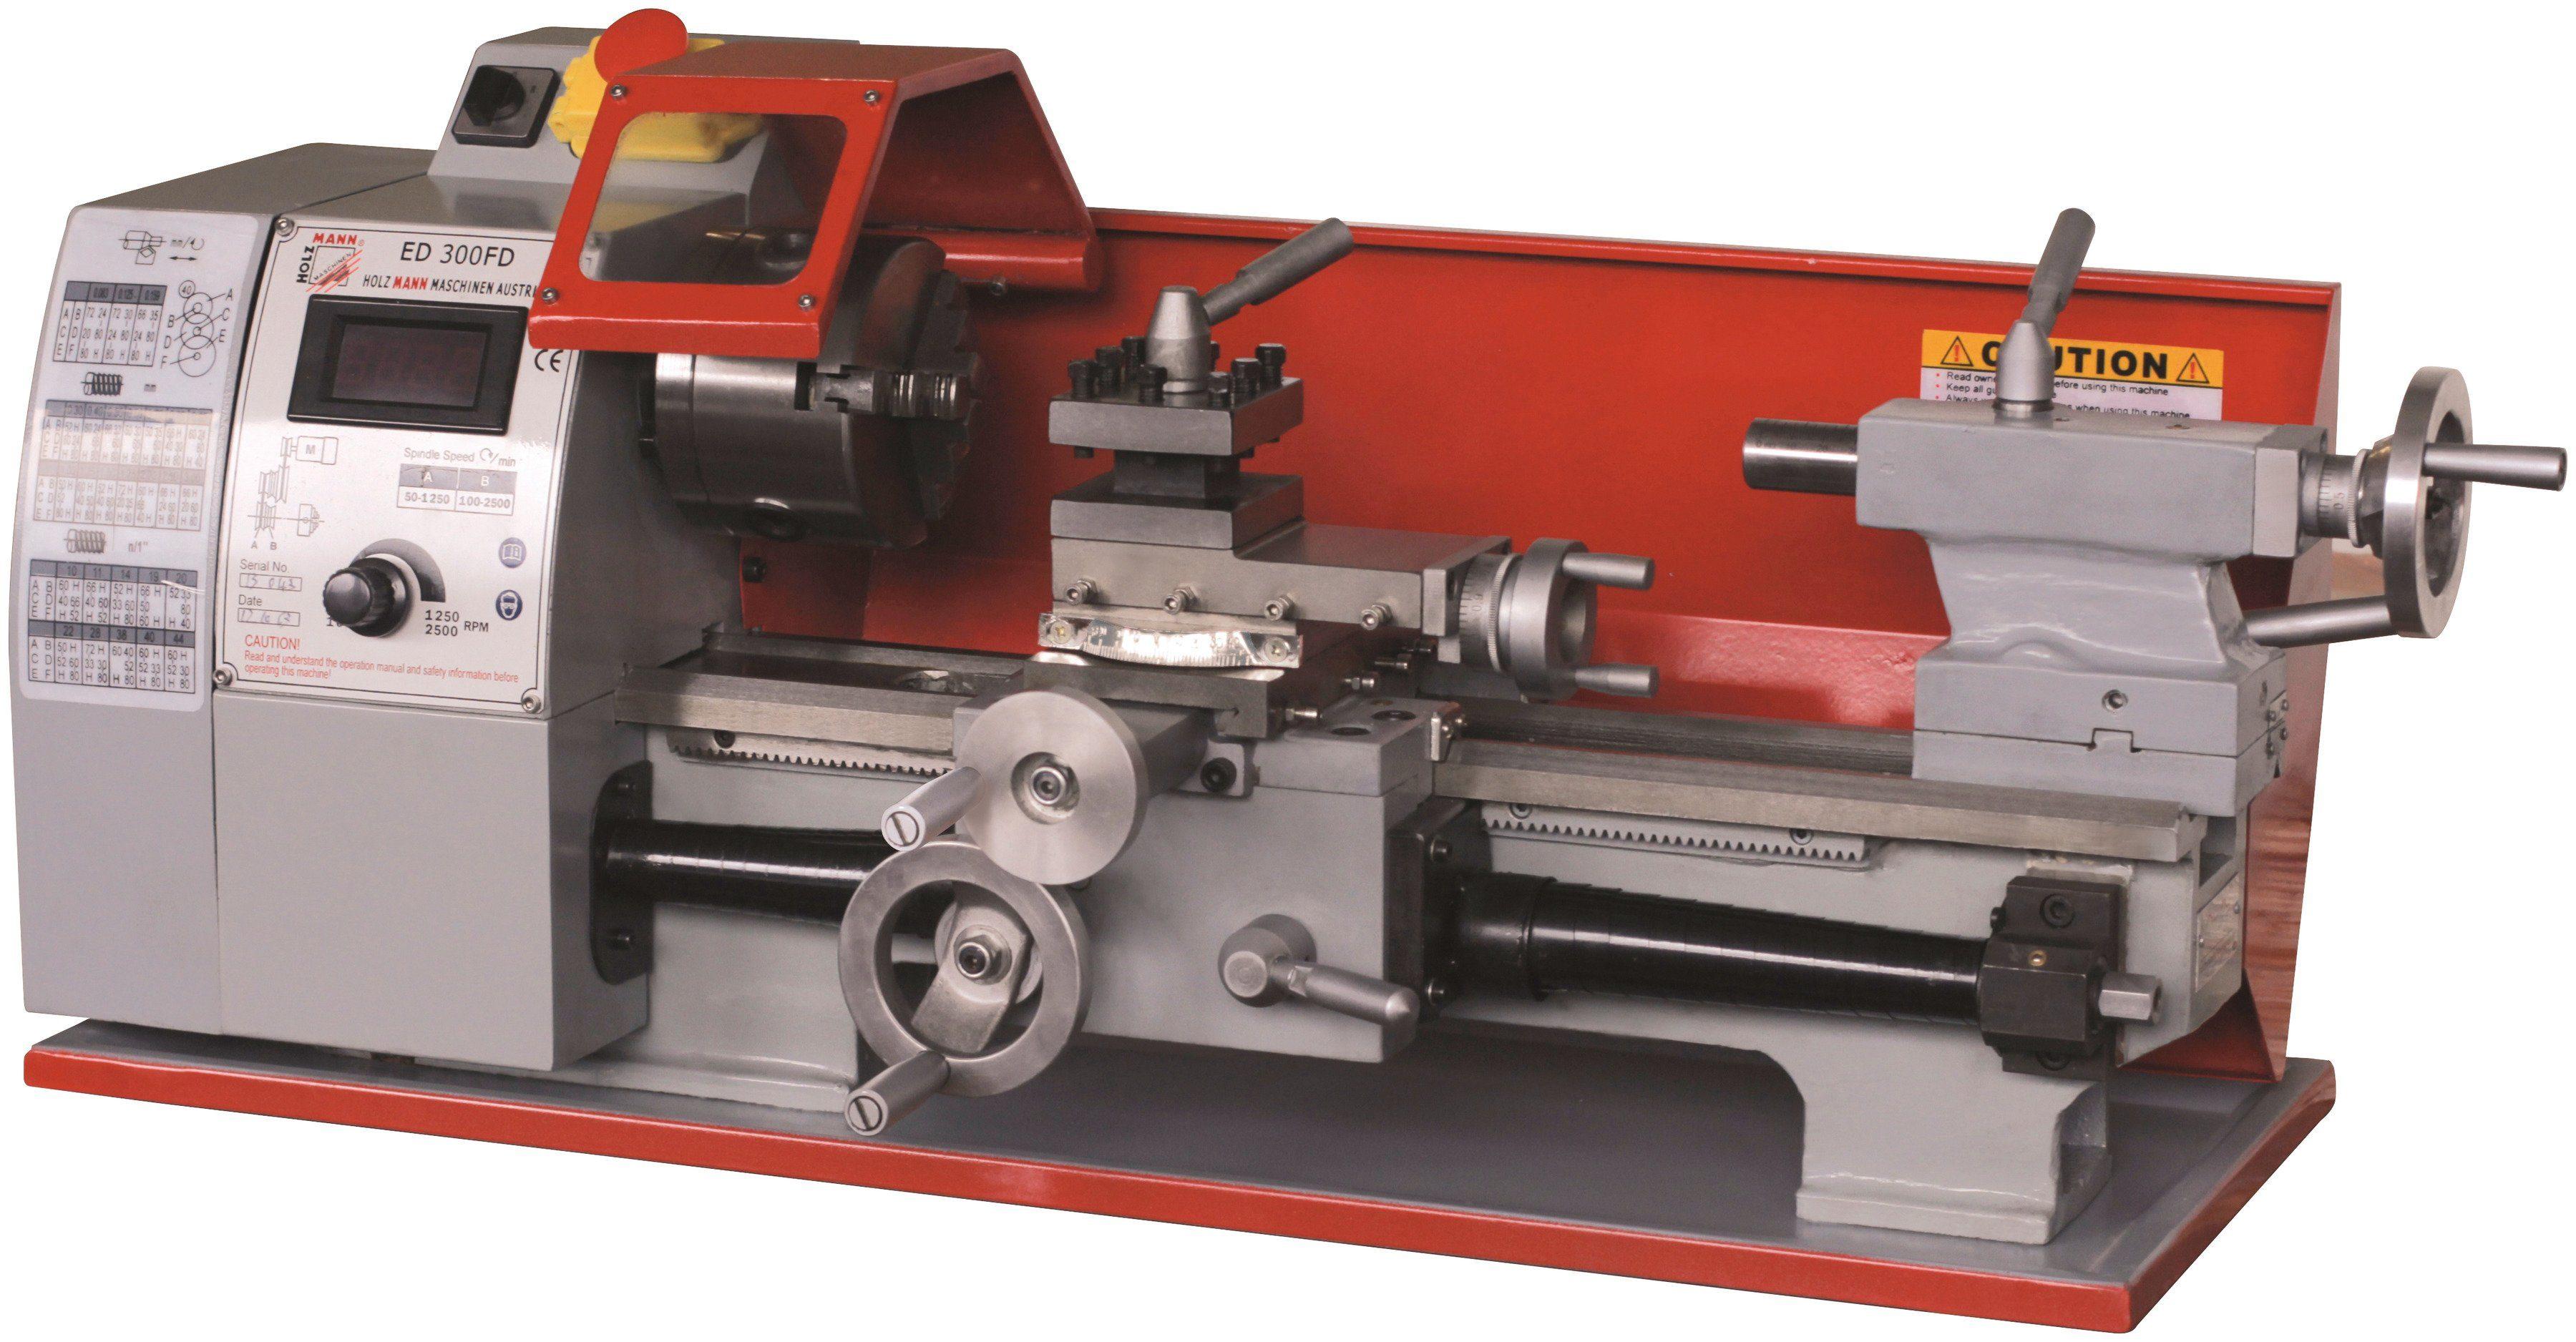 Holzmann-Maschinen Tischdrehmaschine »ED 300FD«